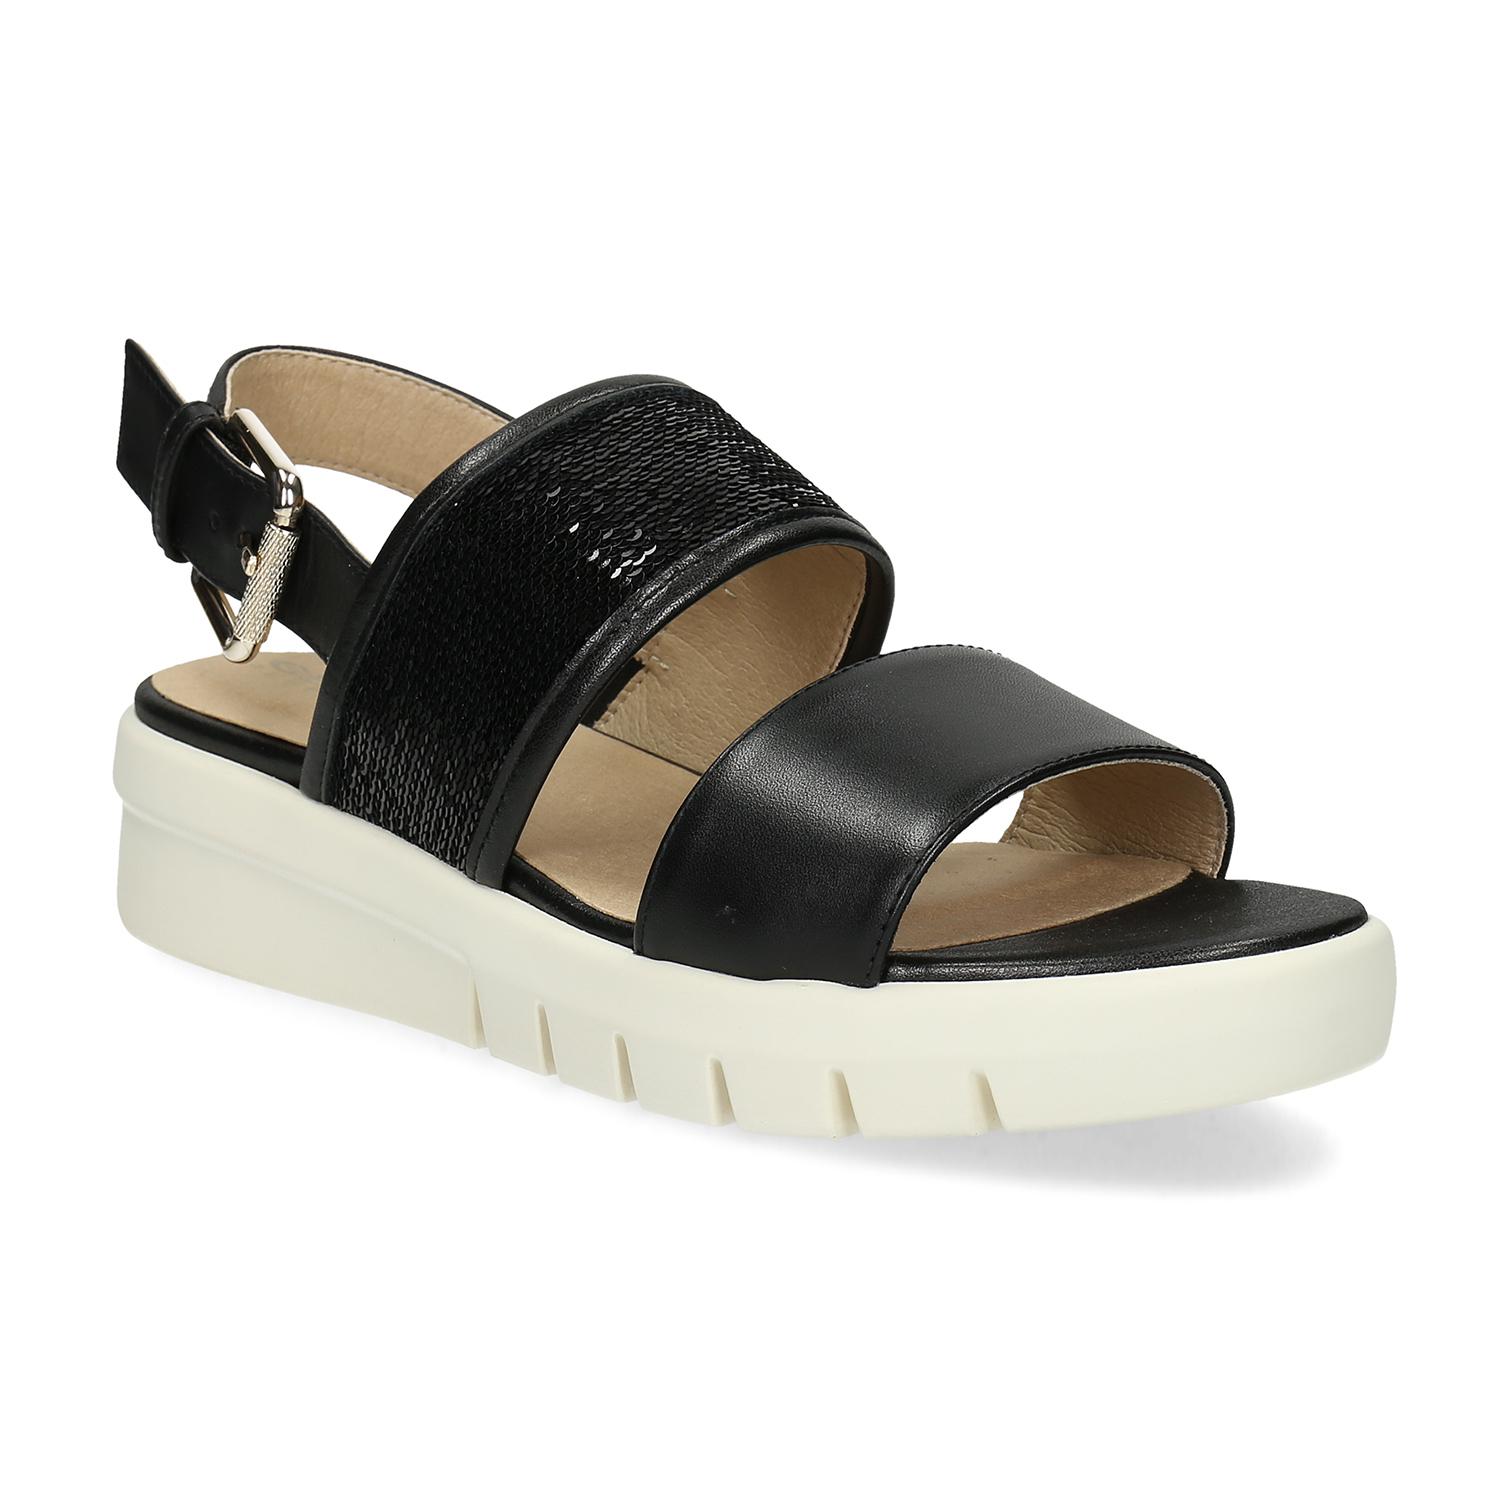 Dámske sandále čierne